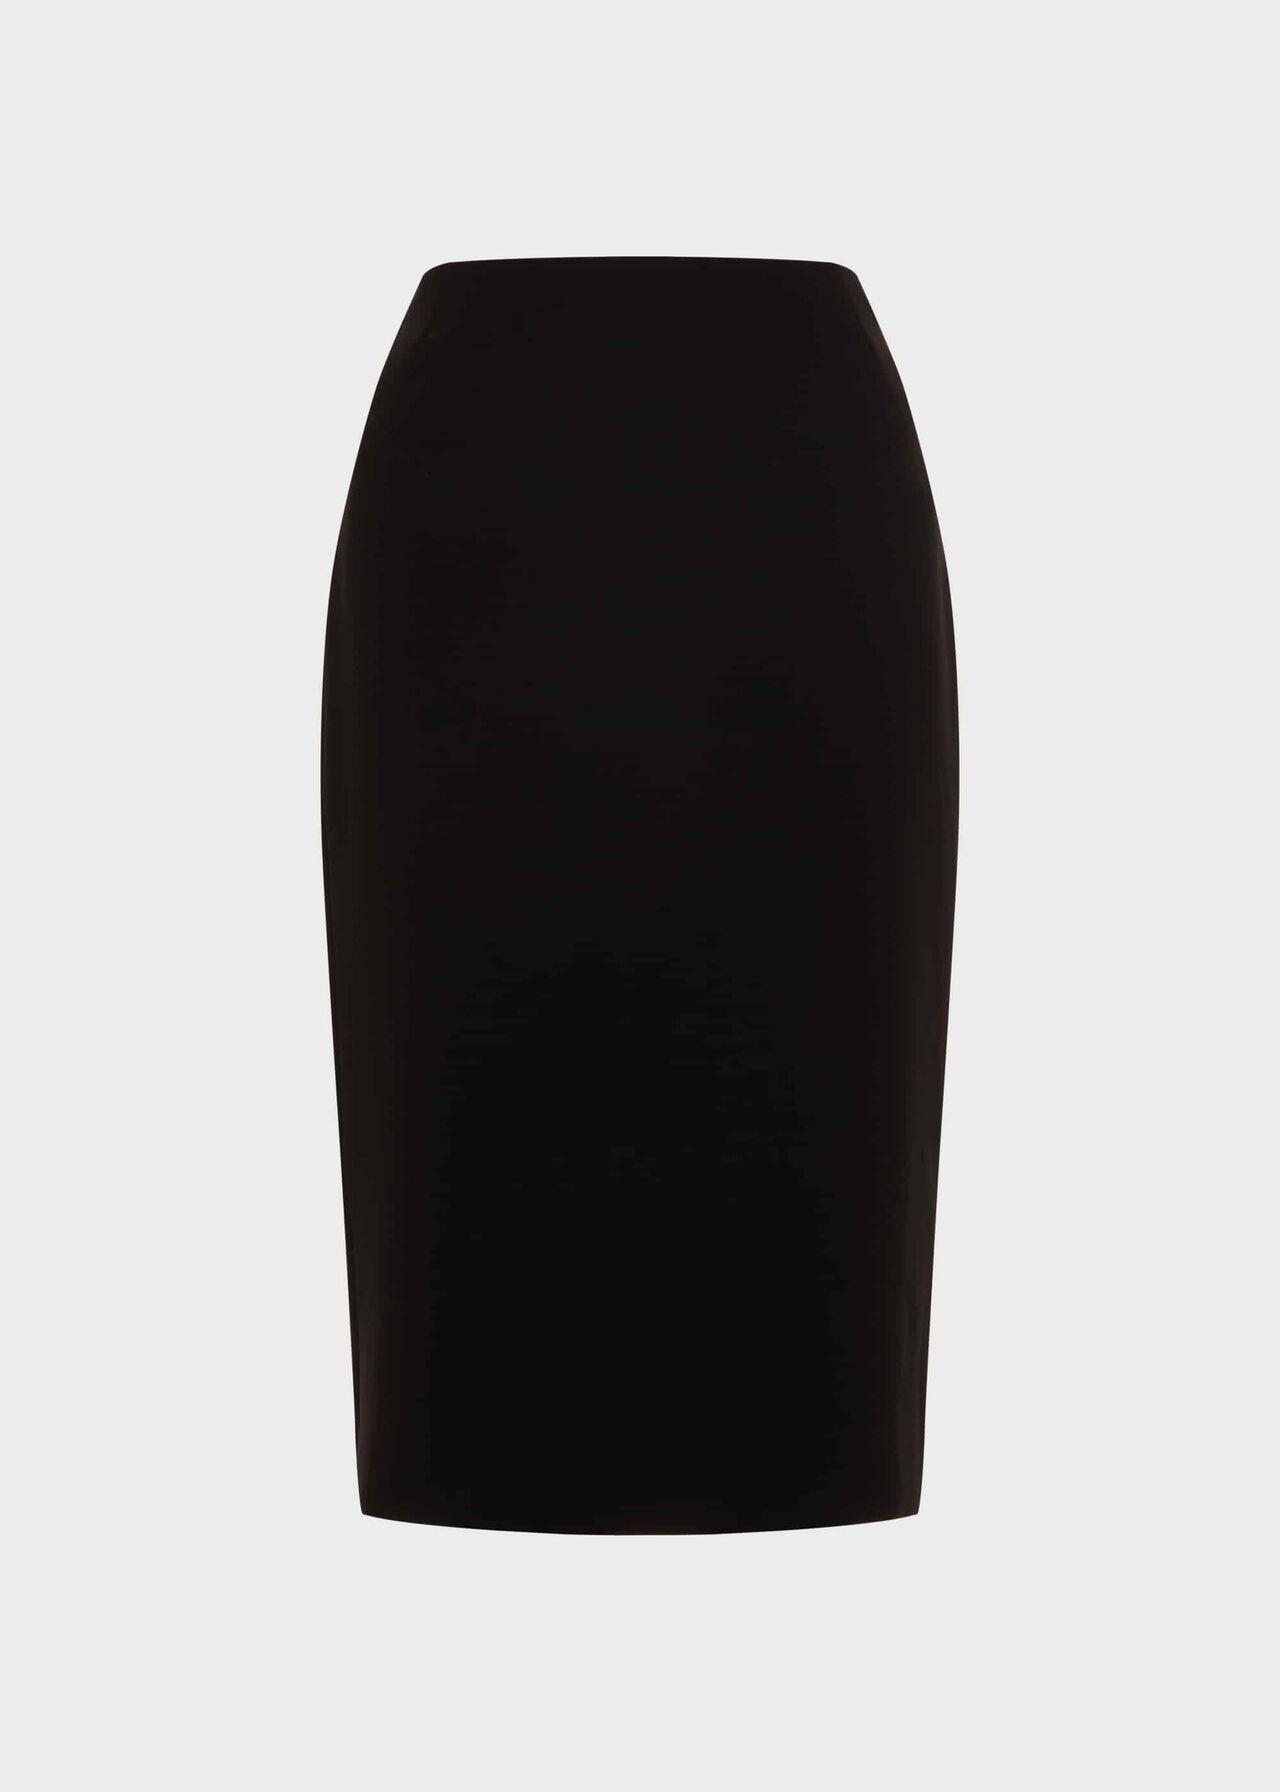 Petite Alva Skirt Black